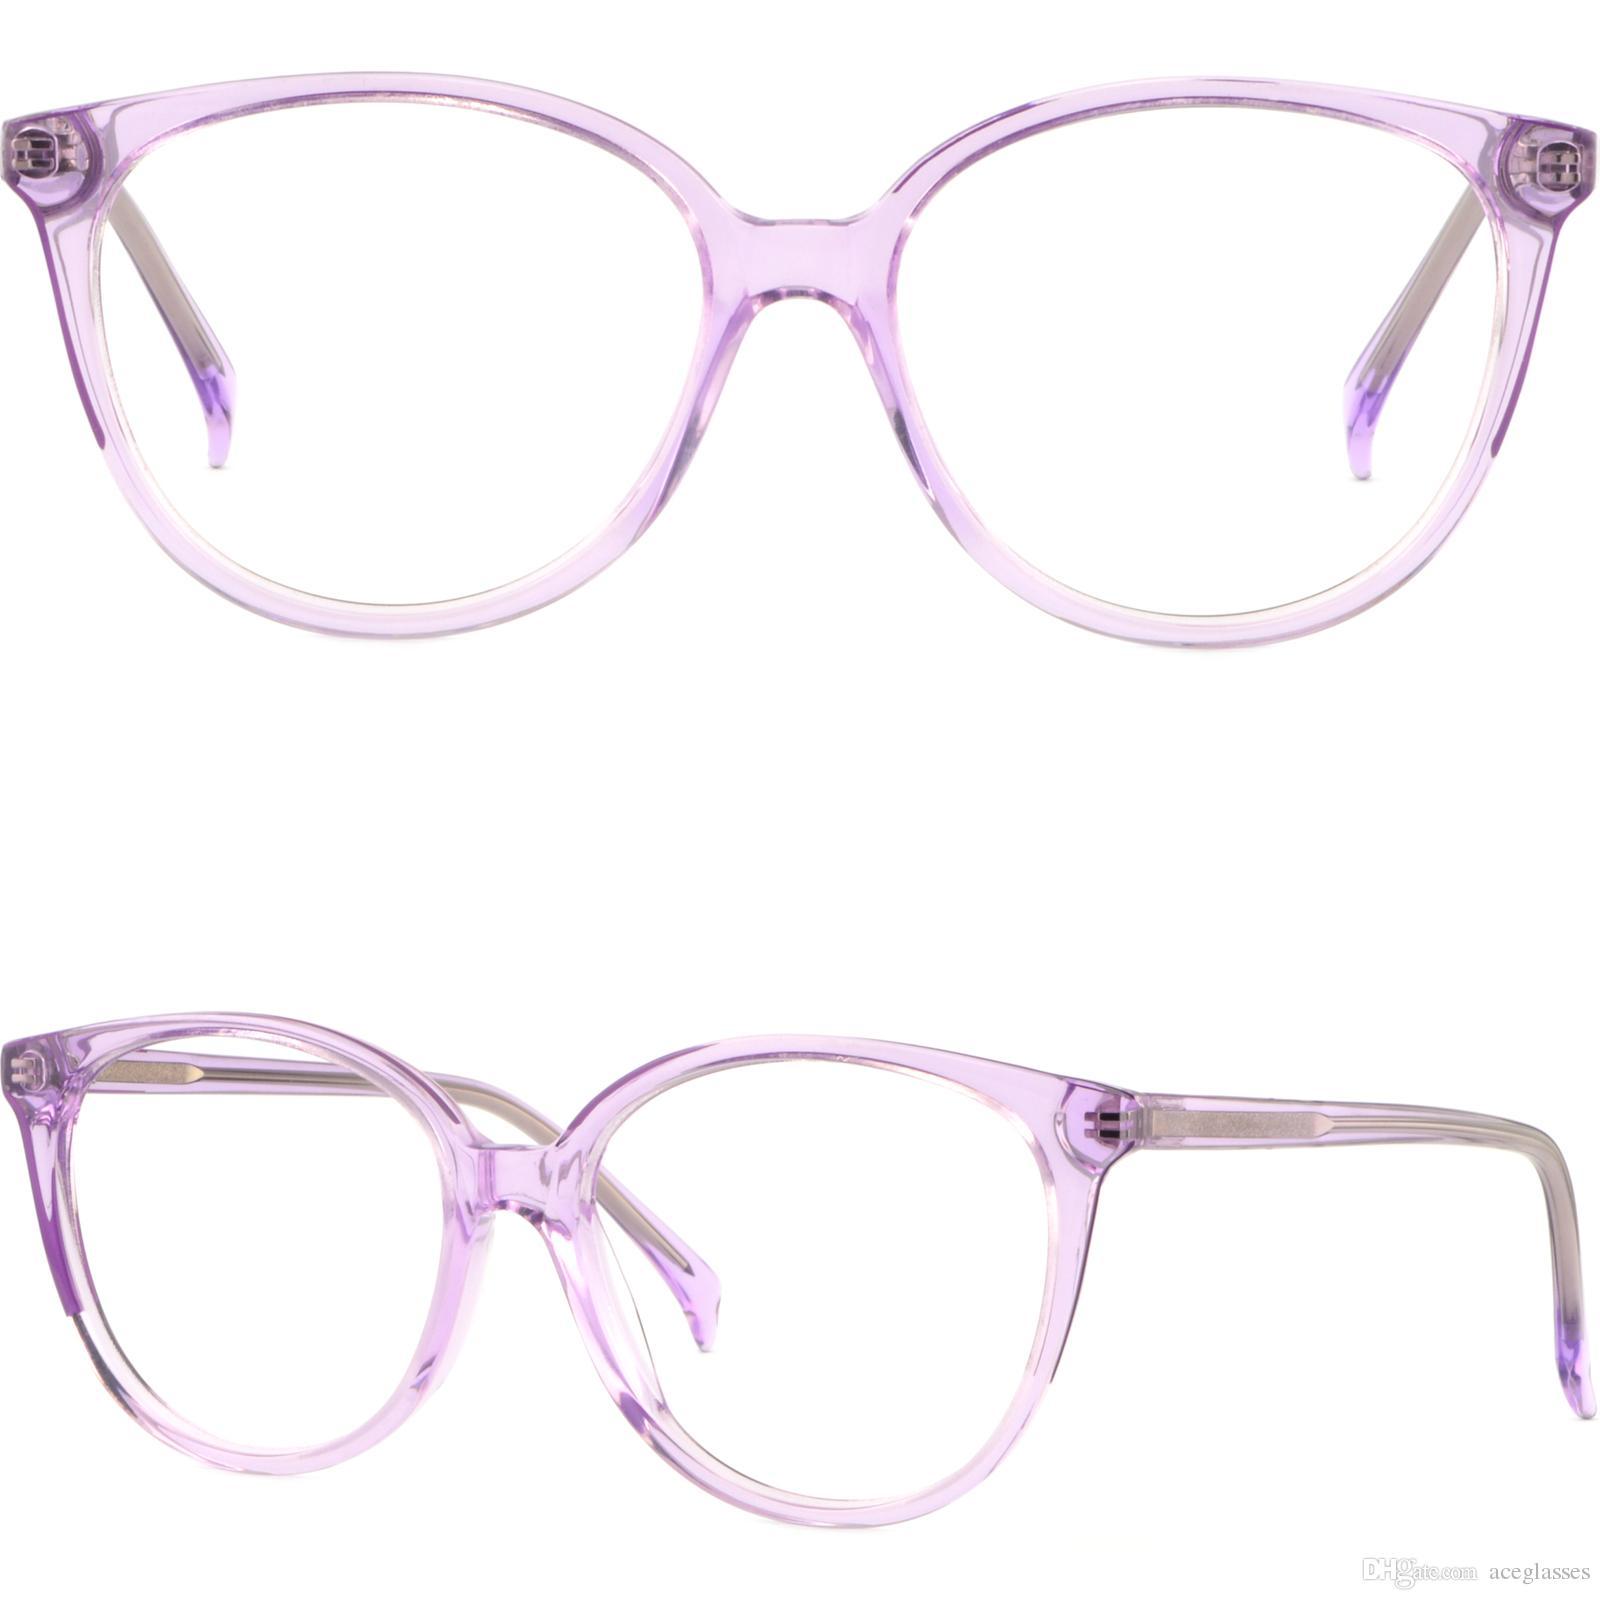 Occhiali da vista in plastica leggera Occhiali in acetato sottile Lavanda viola Brillengestell Fassung Damenbrille Rund